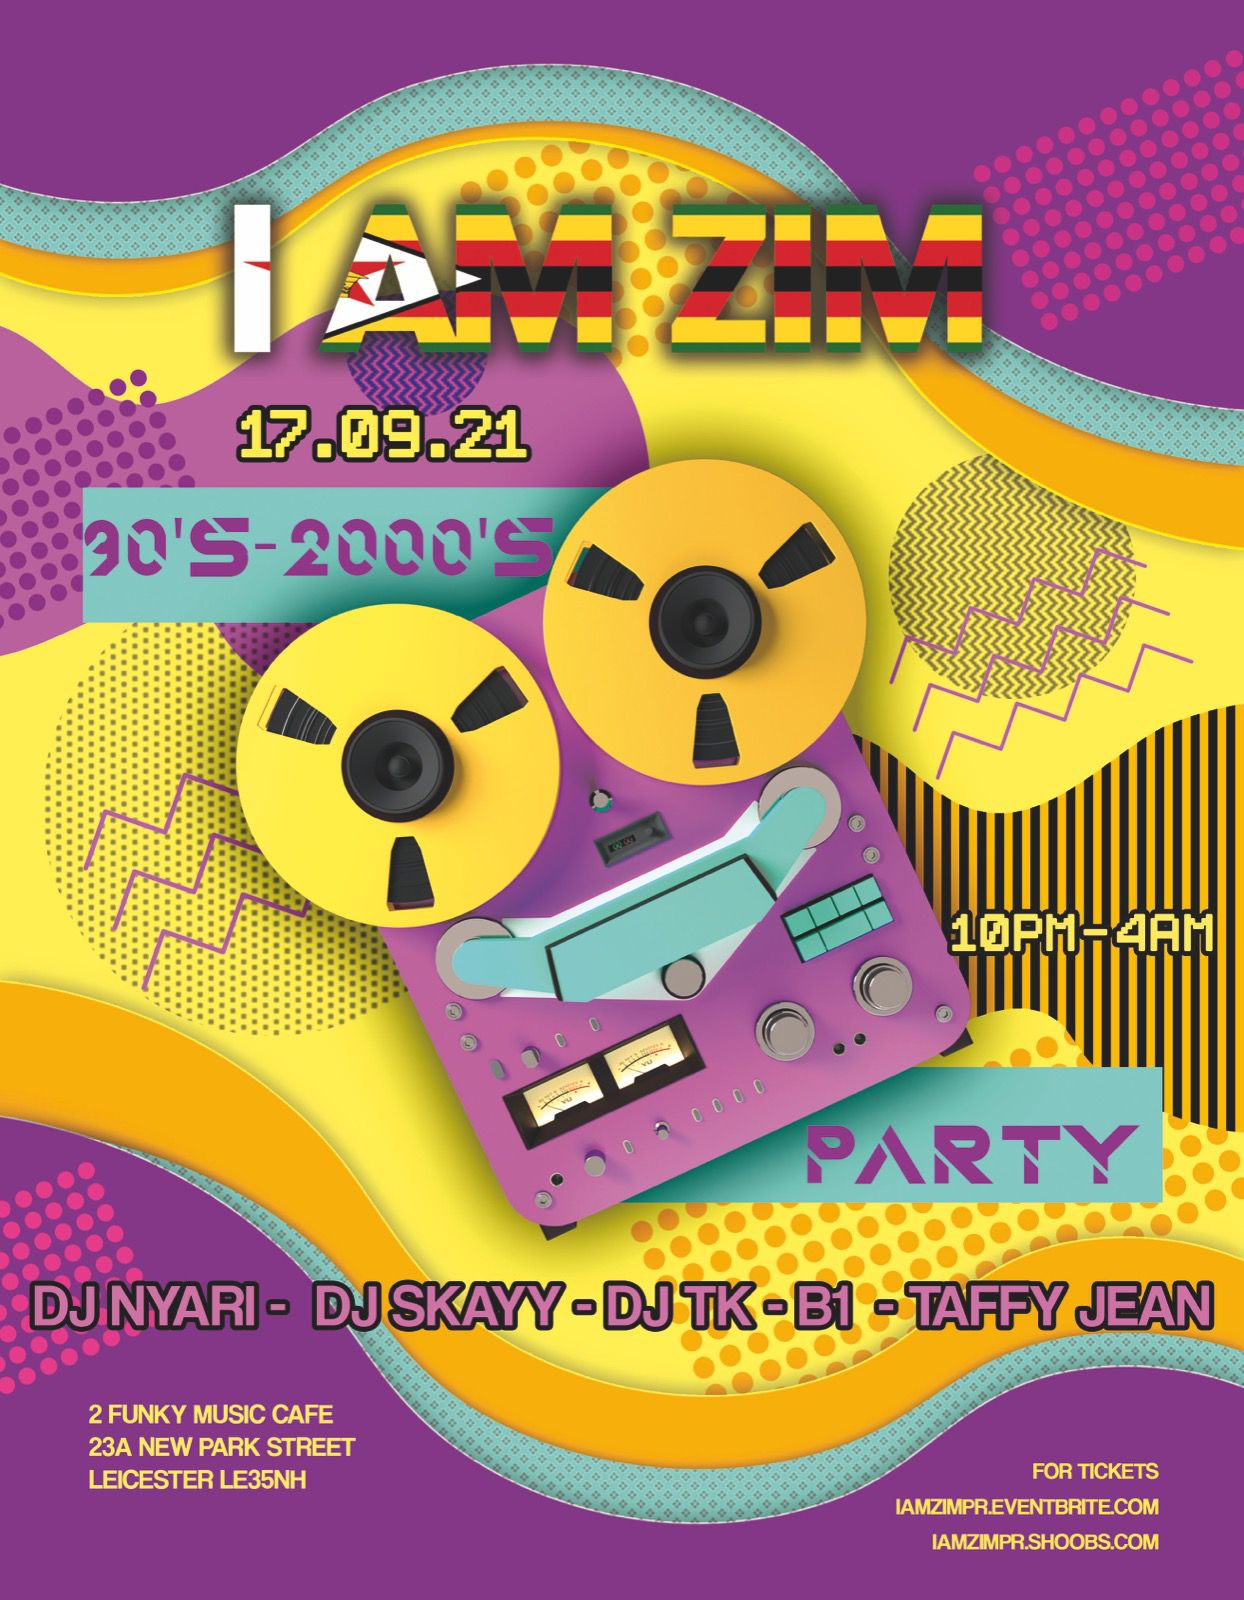 I AM ZIM 90'S VS 2000'S PARTY